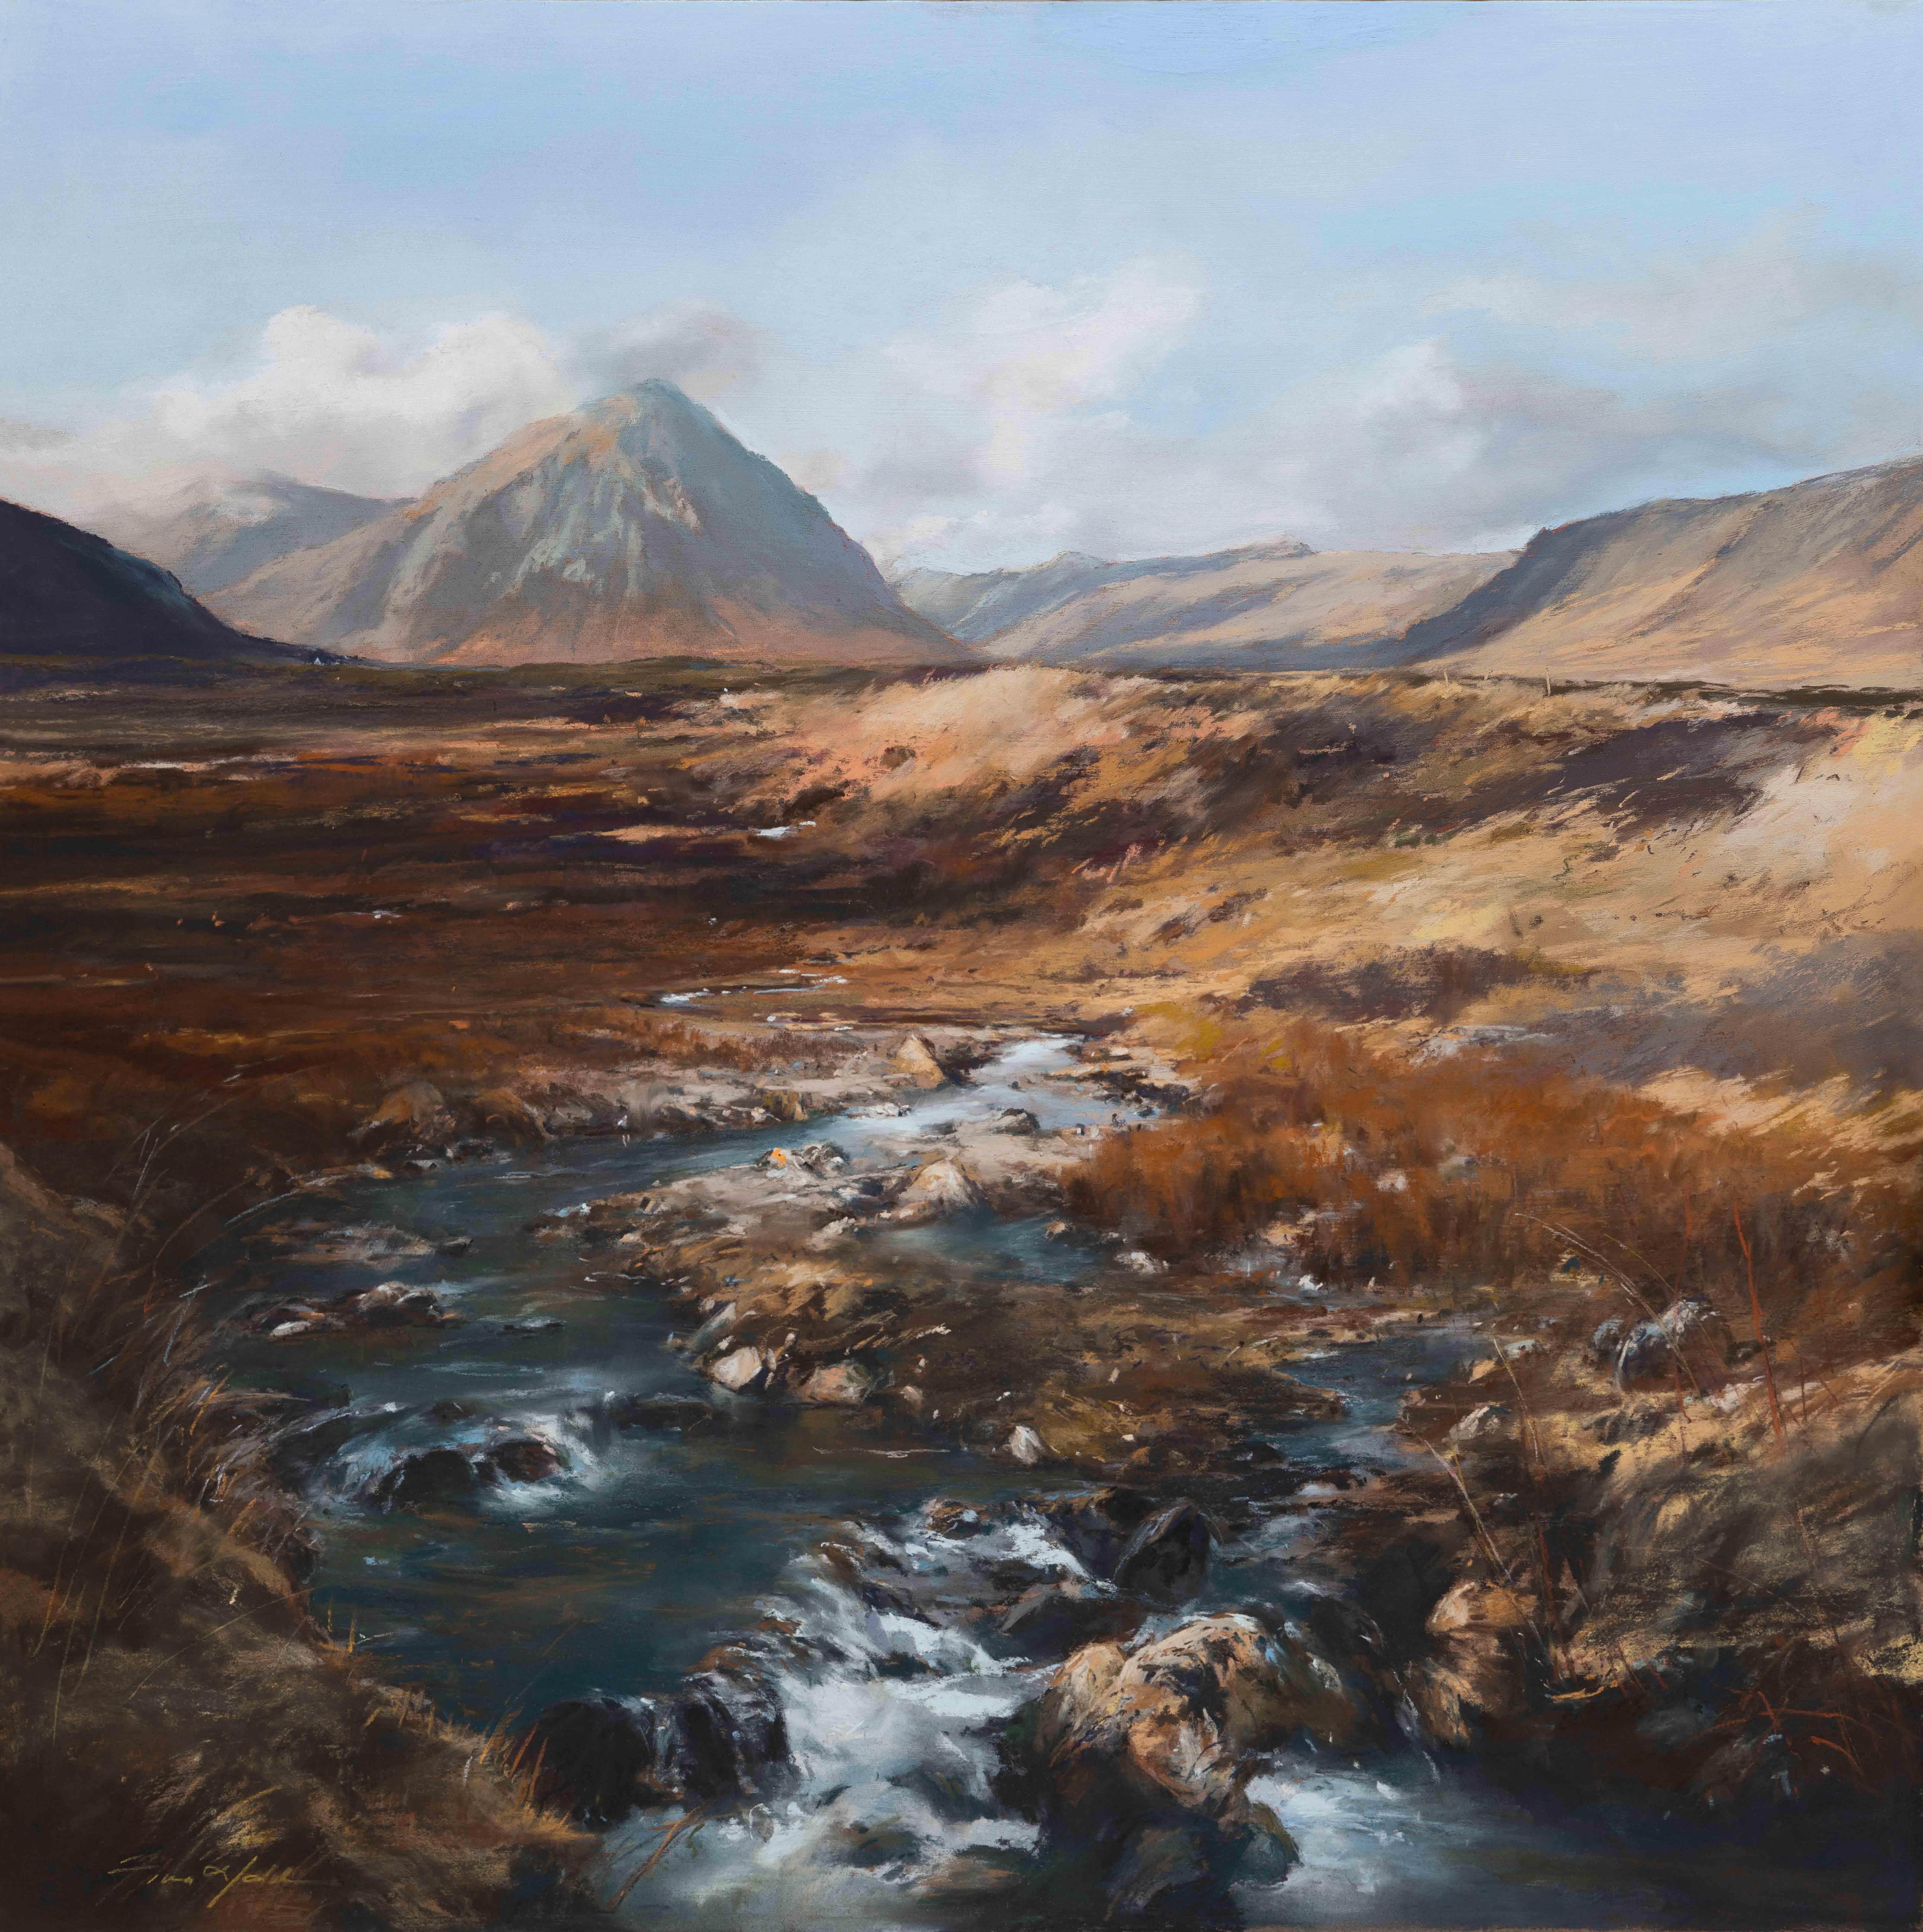 HAL14_Fiona Haldane_Autumn, Glencoe_LOW RES